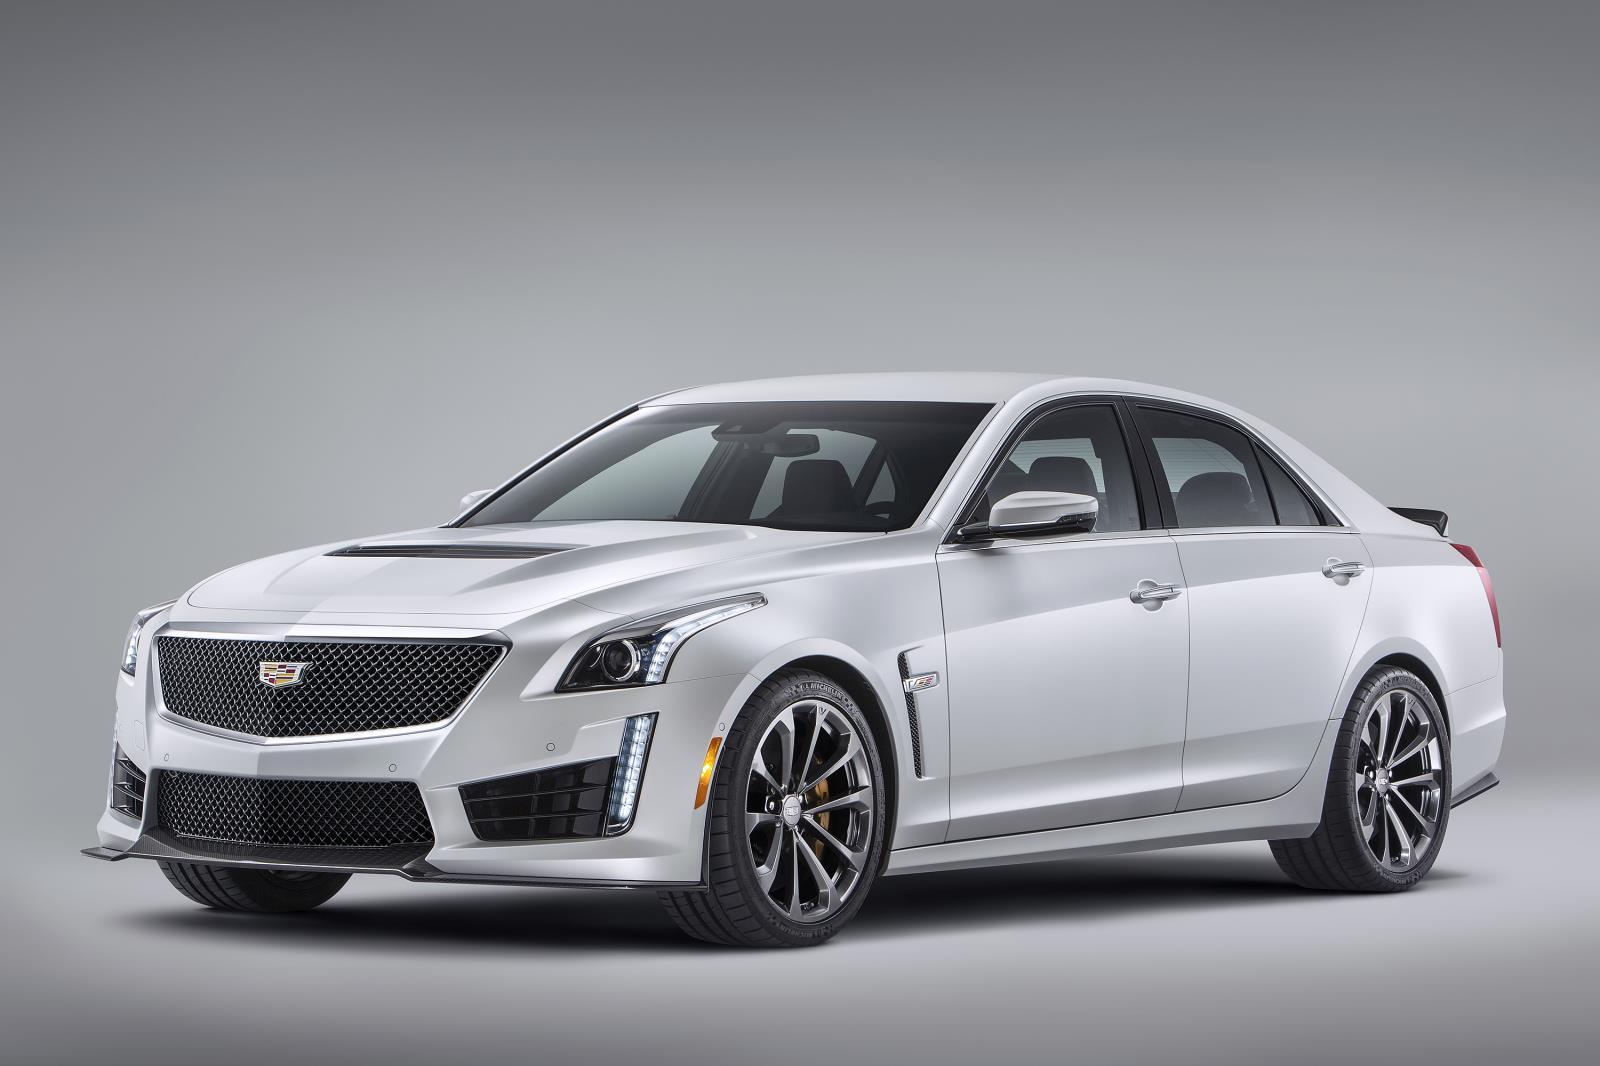 Cadillac Cts V Features Michelin Pilot Super Sport Tires